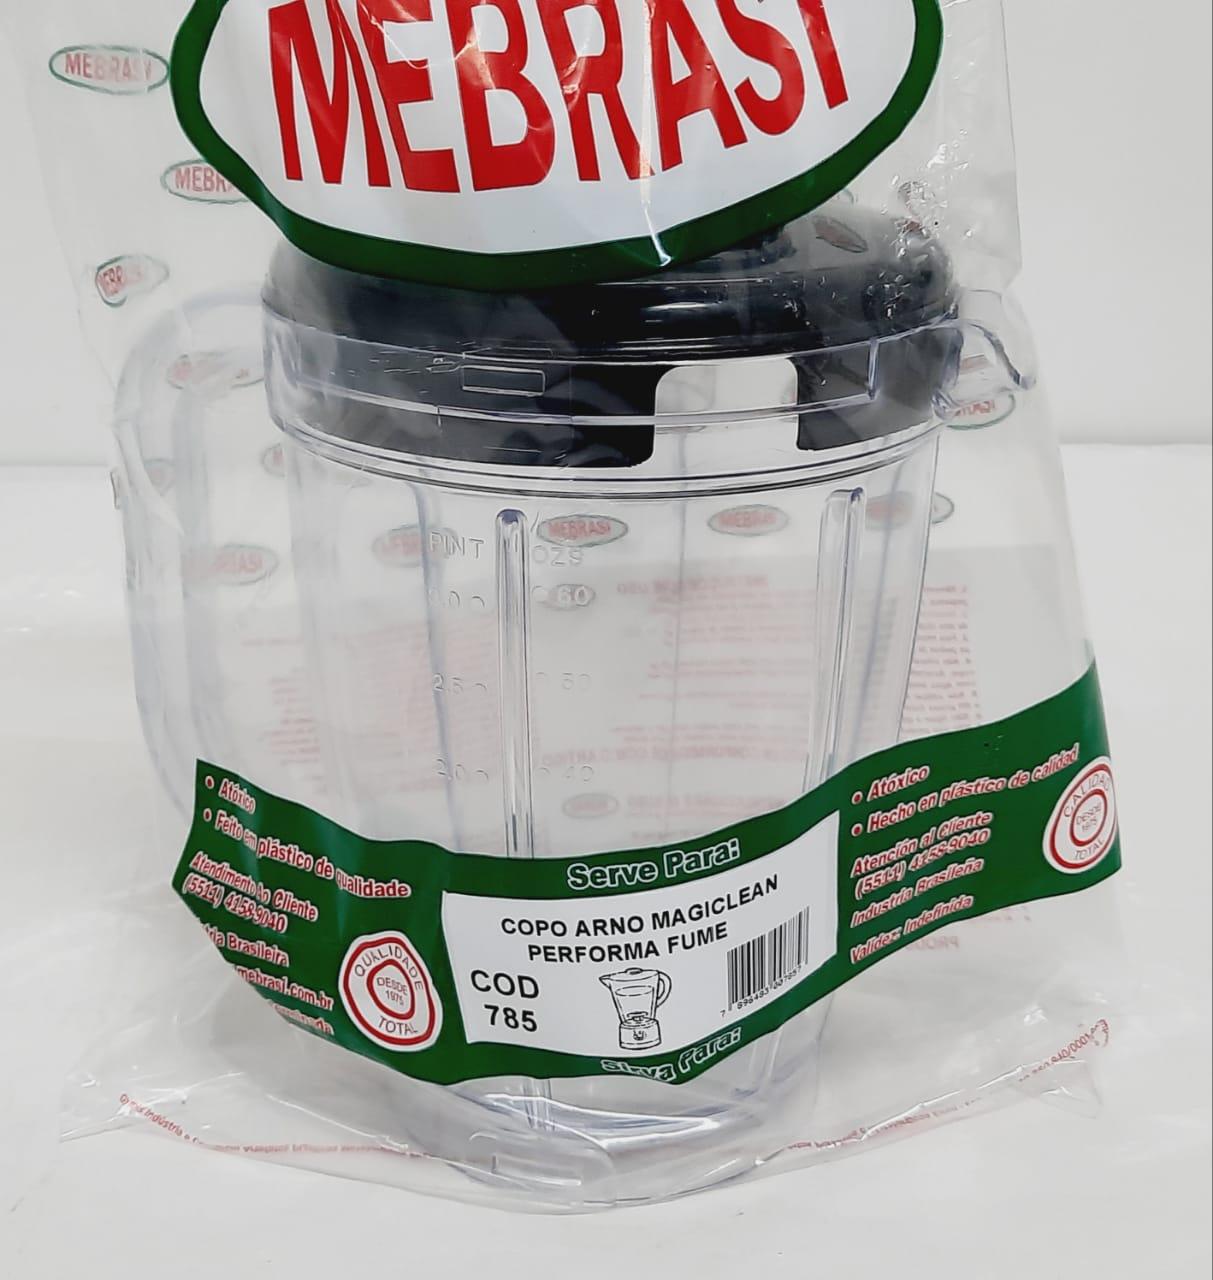 Copo Arno Cristal FU Magiclean Performa - Mebrasi